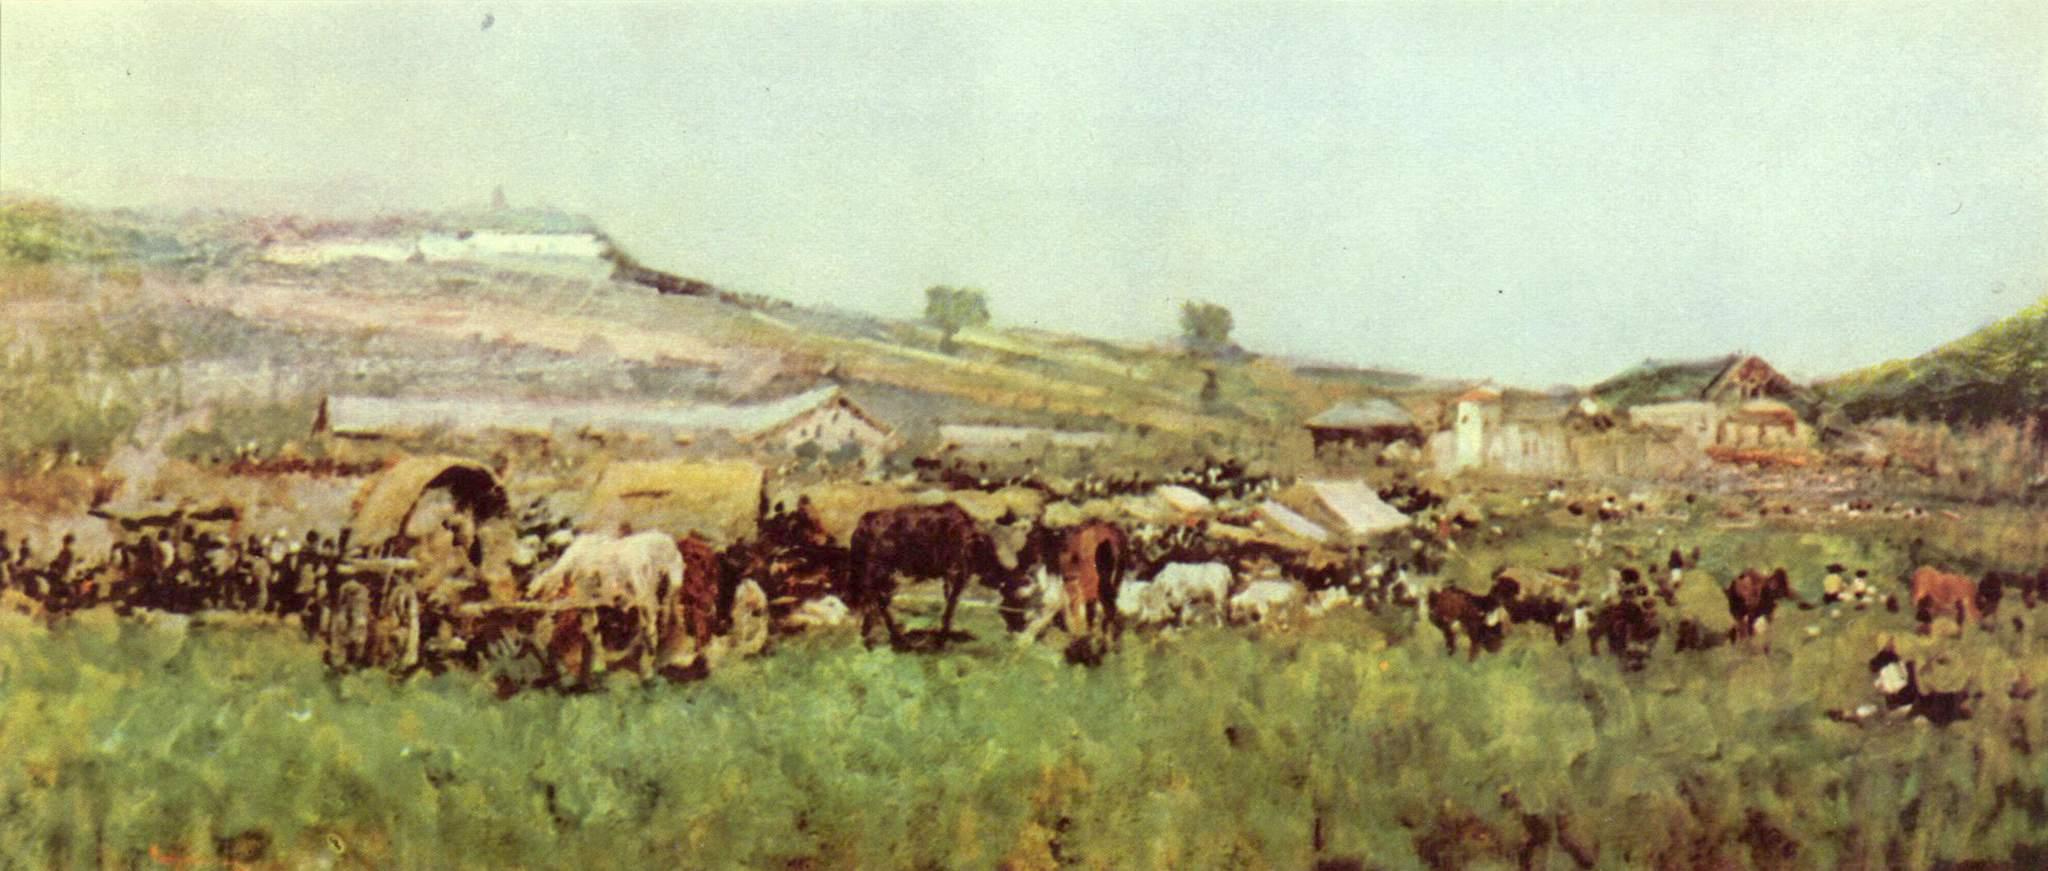 Original file      2 048   215  871 pixels  file size  183 KB  MIME type    Nicolae Grigorescu Paintings